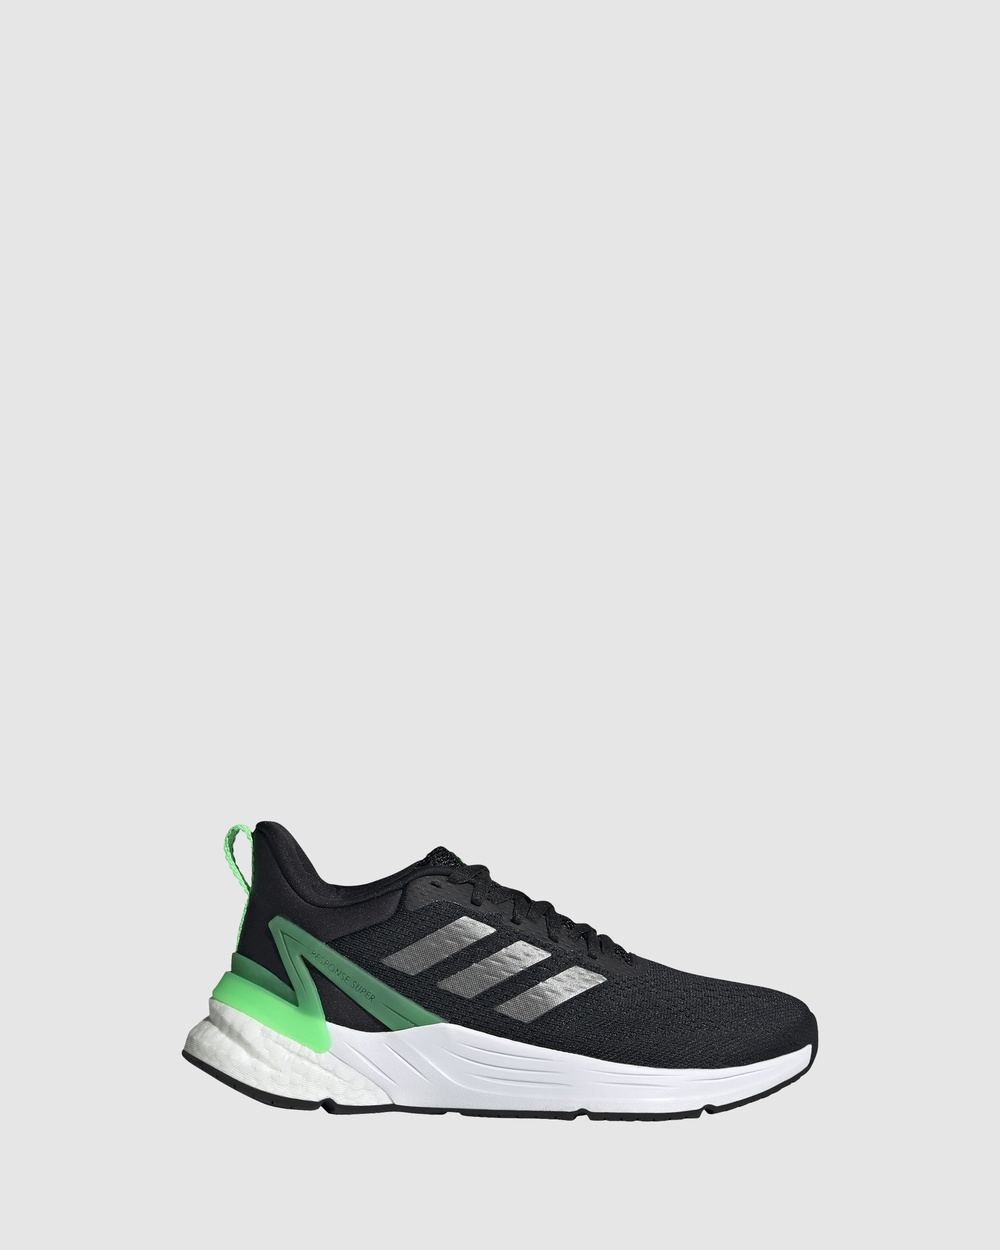 adidas Performance Response Super 2.0 Grade School Lifestyle Shoes Black/Screaming Green